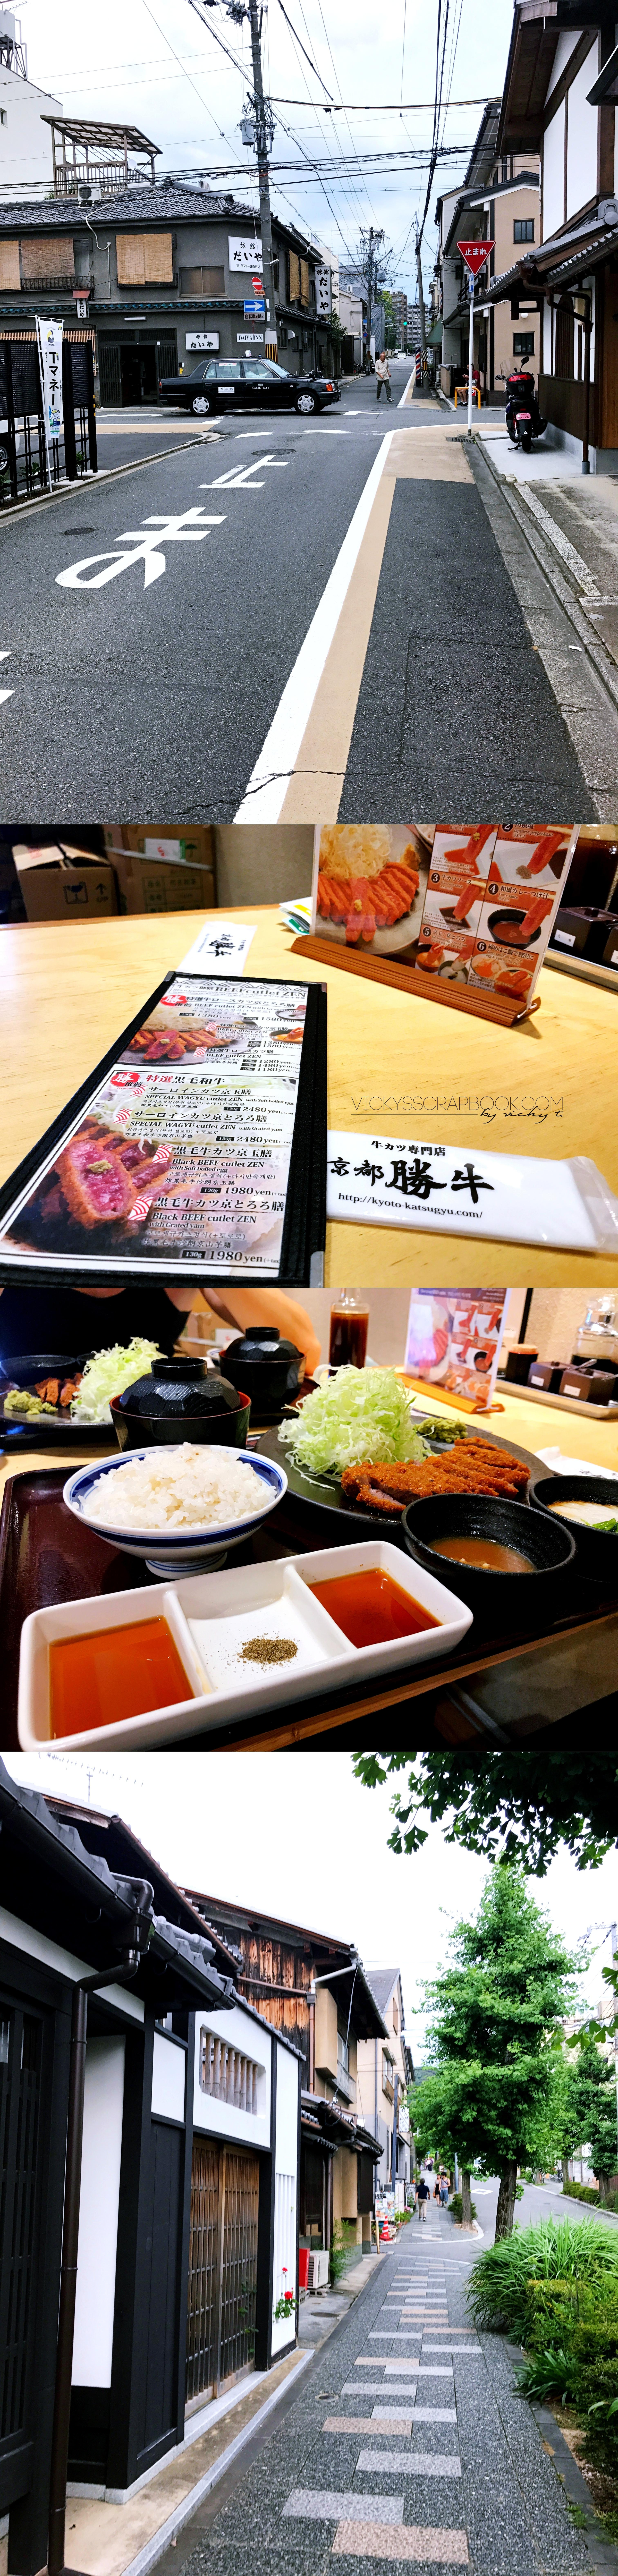 kyoto1_vickyt